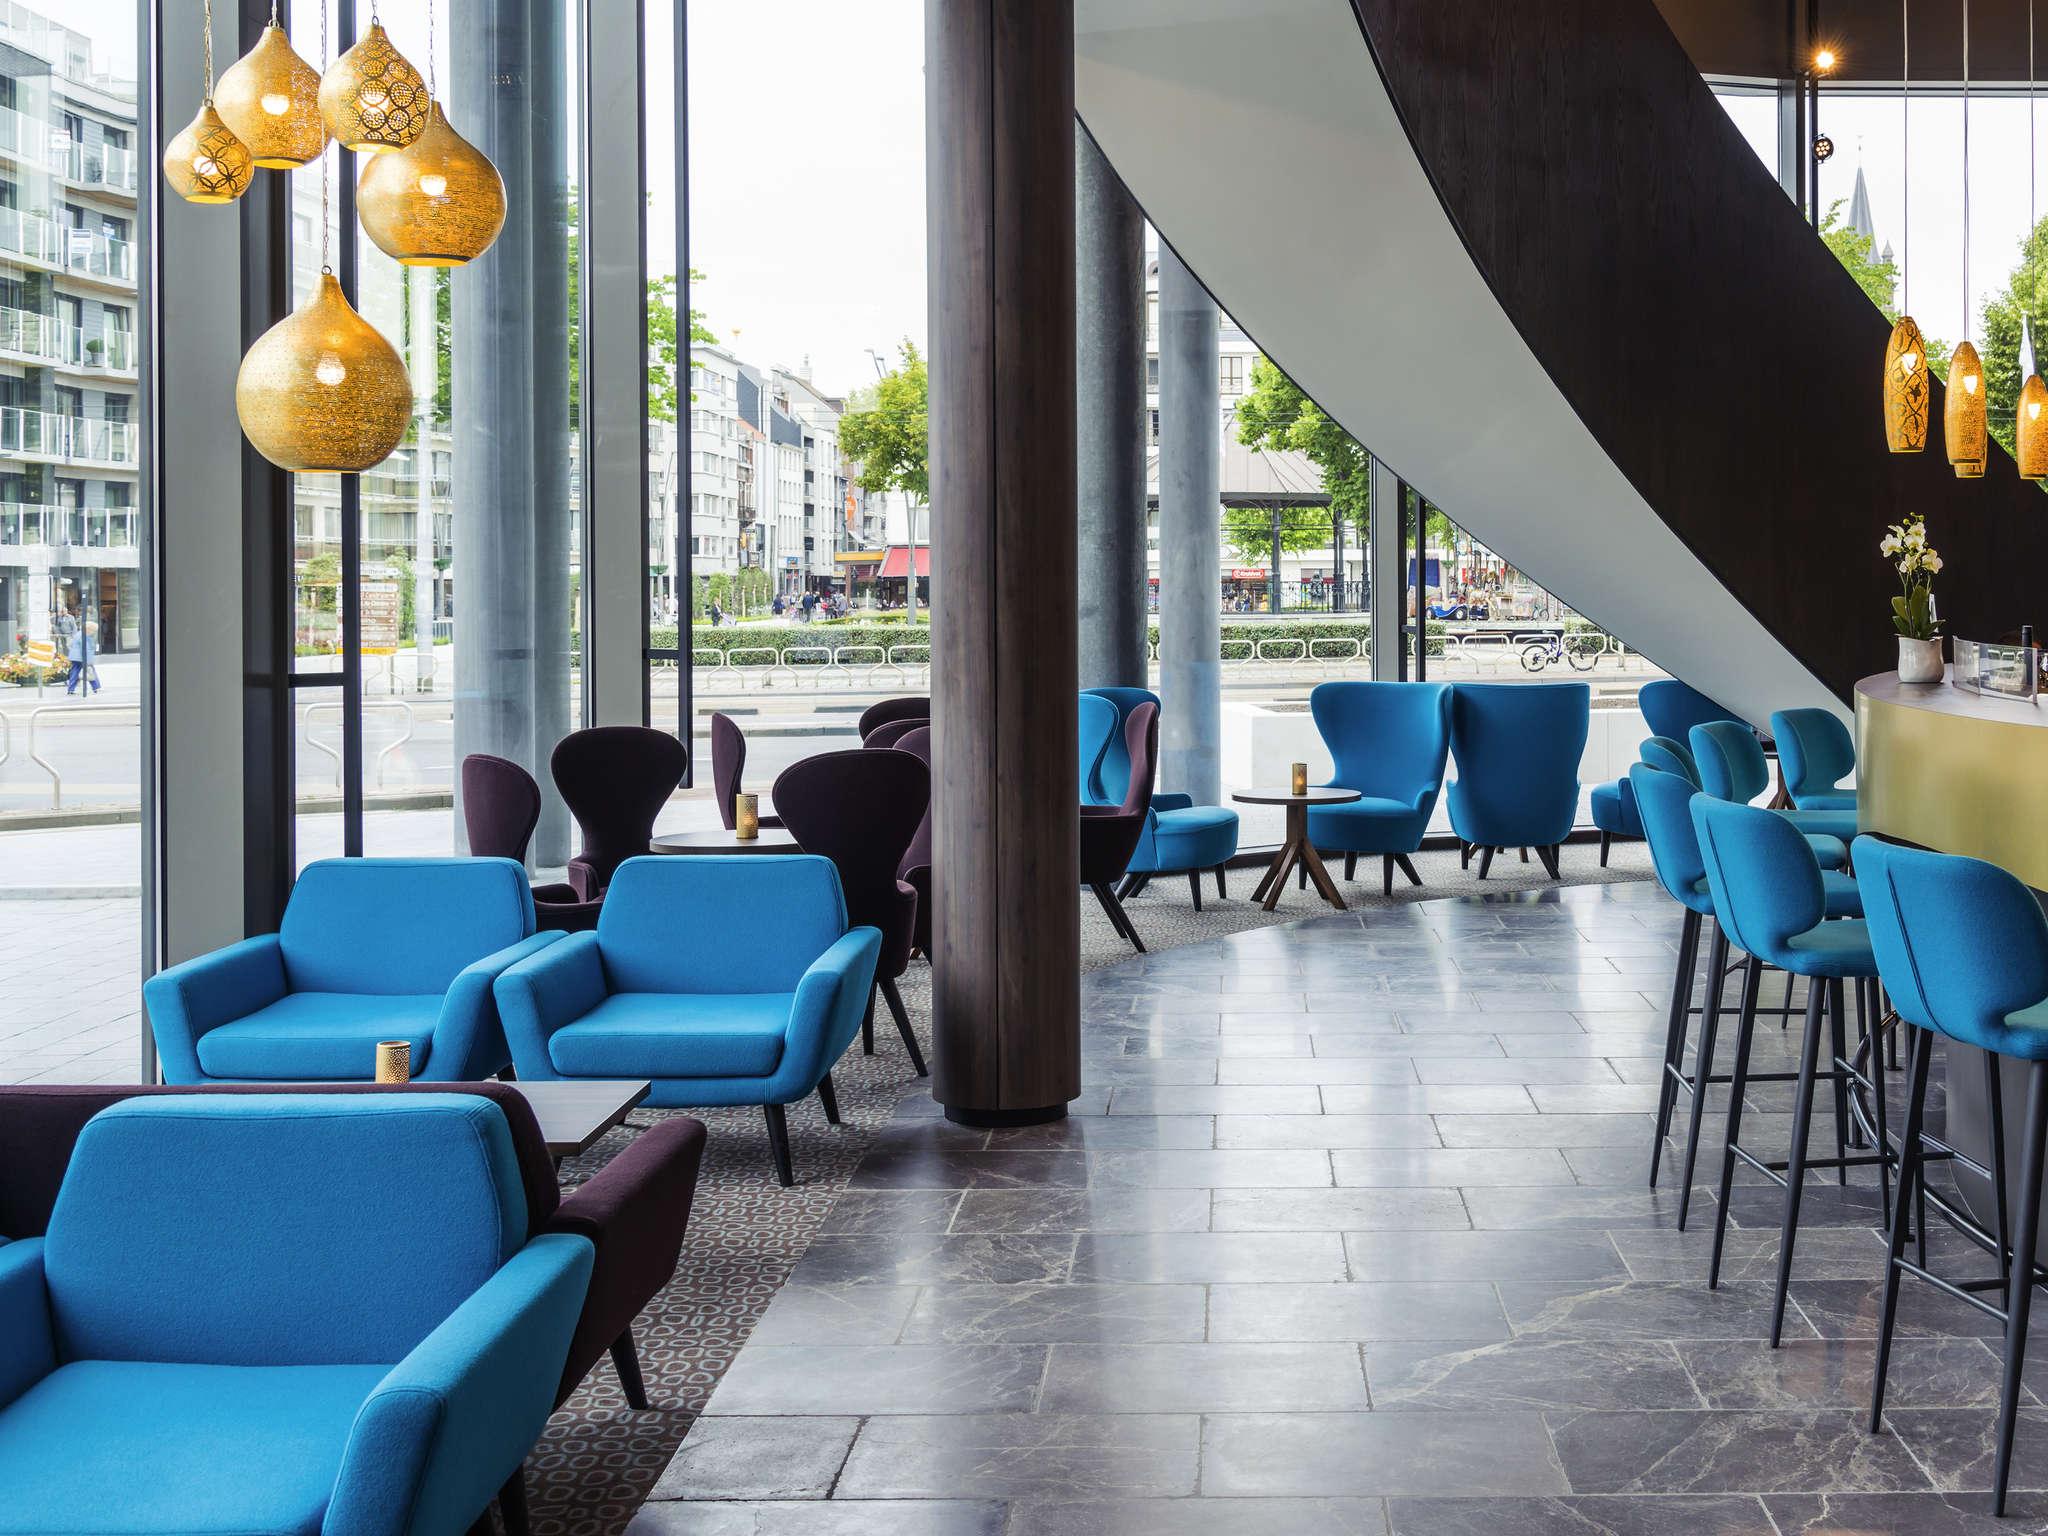 Otel – Hotel Mercure Blankenberge Station